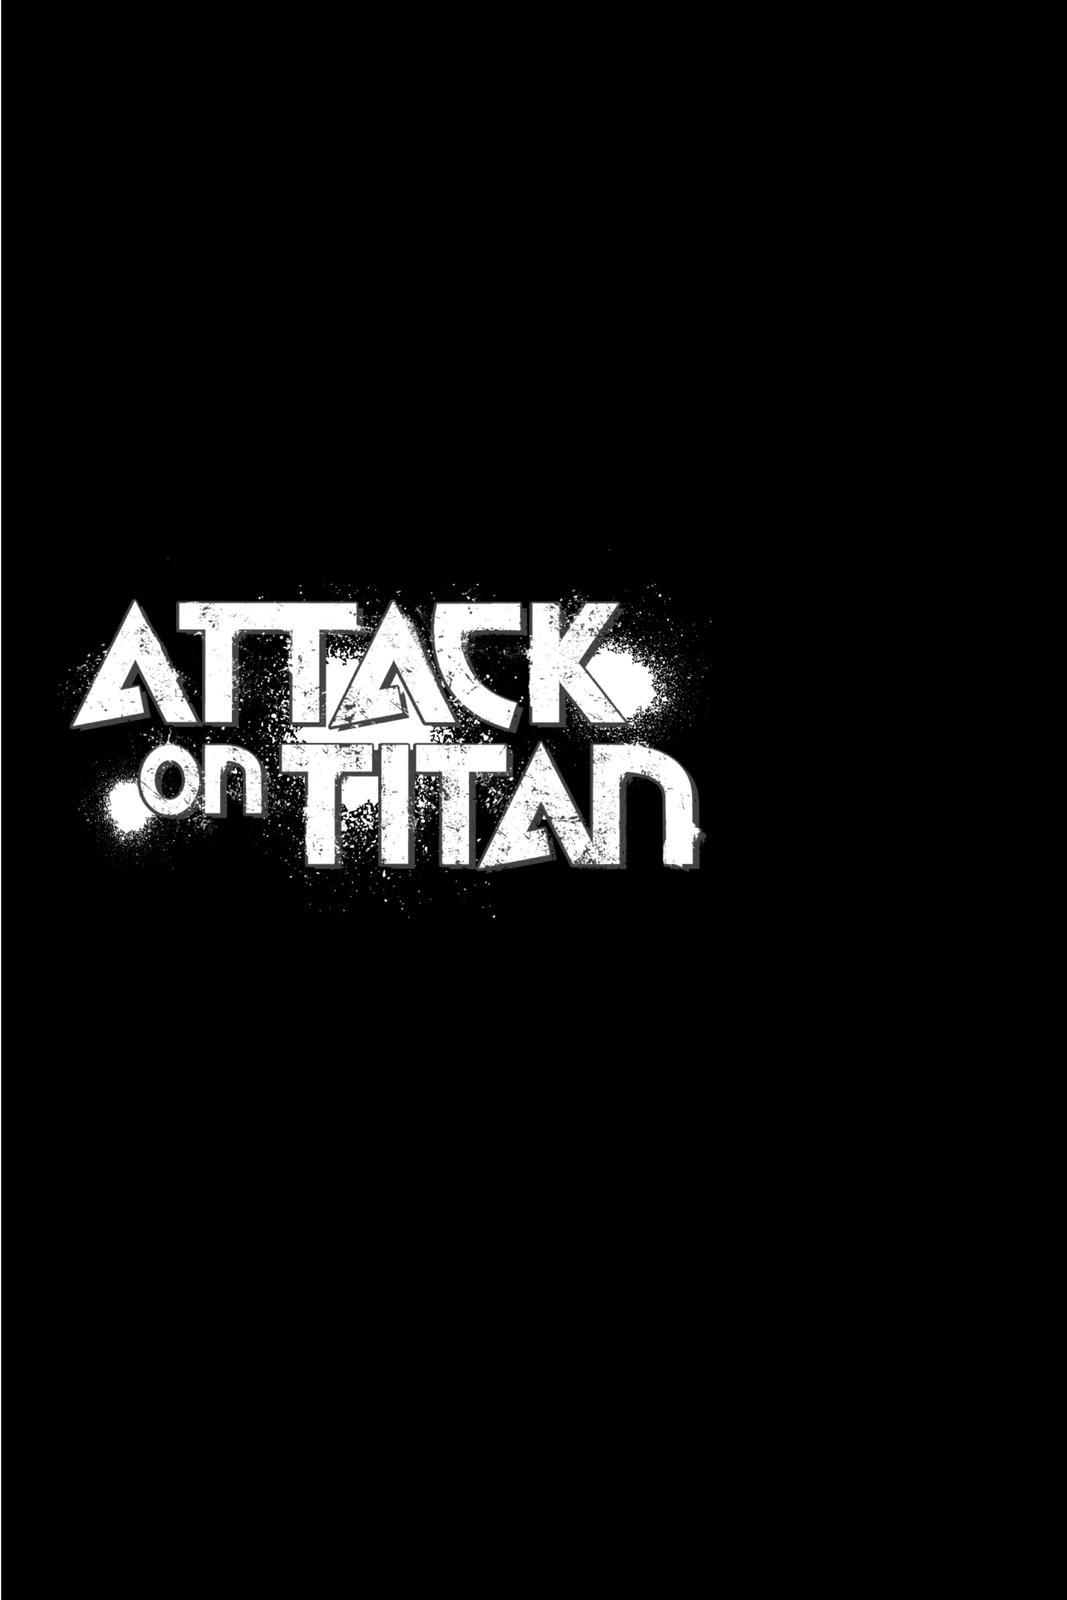 Attack On Titan, Episode 129 image 045